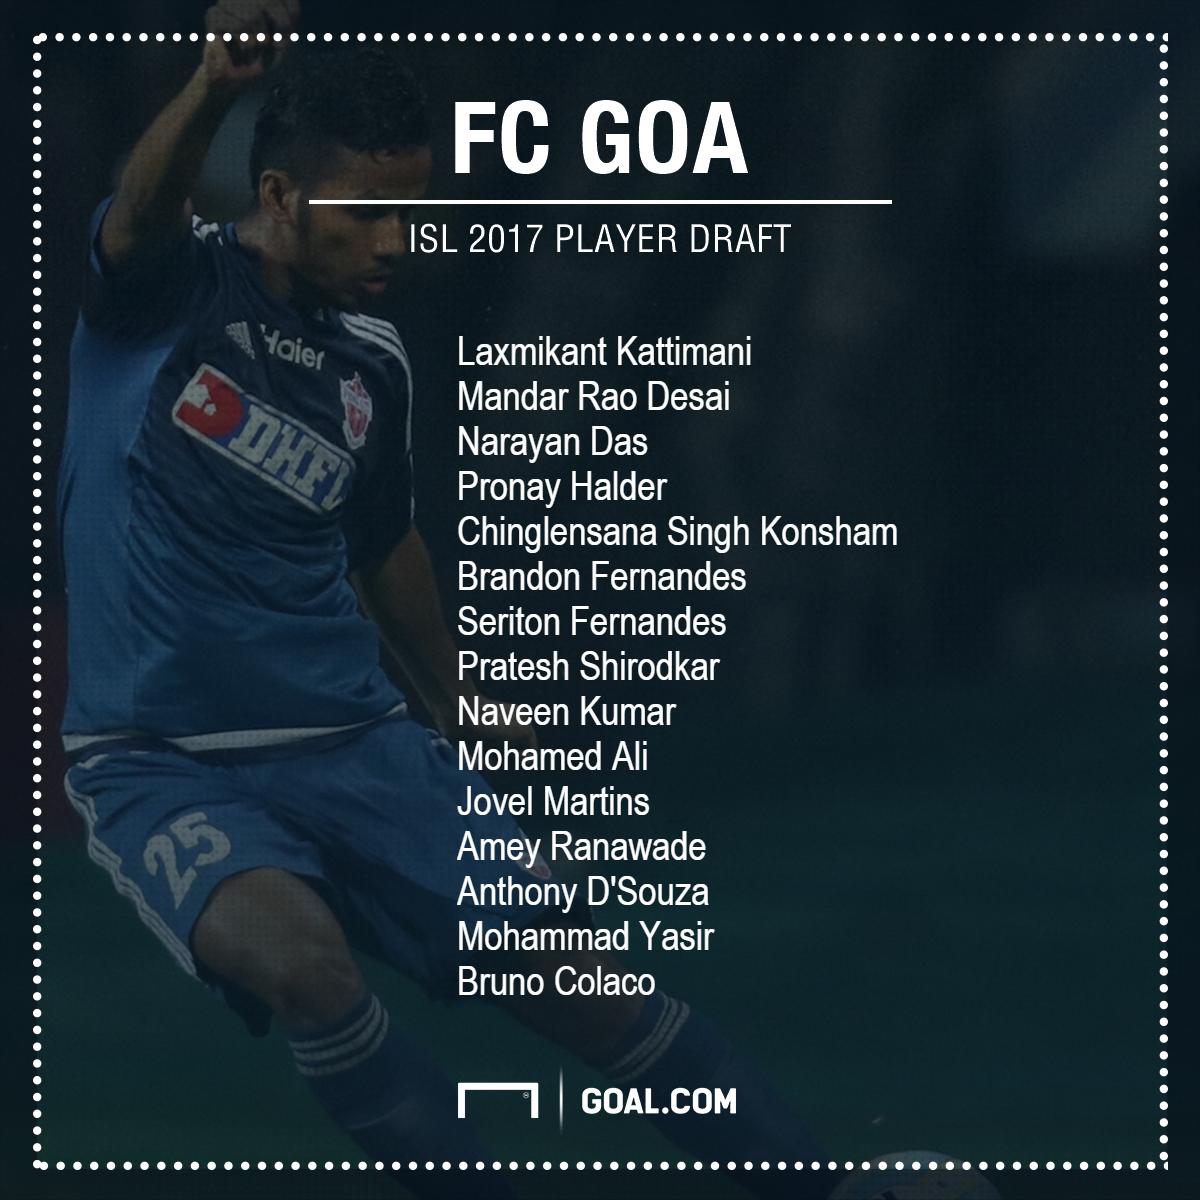 FC Goa ISL 2017 Player Draft